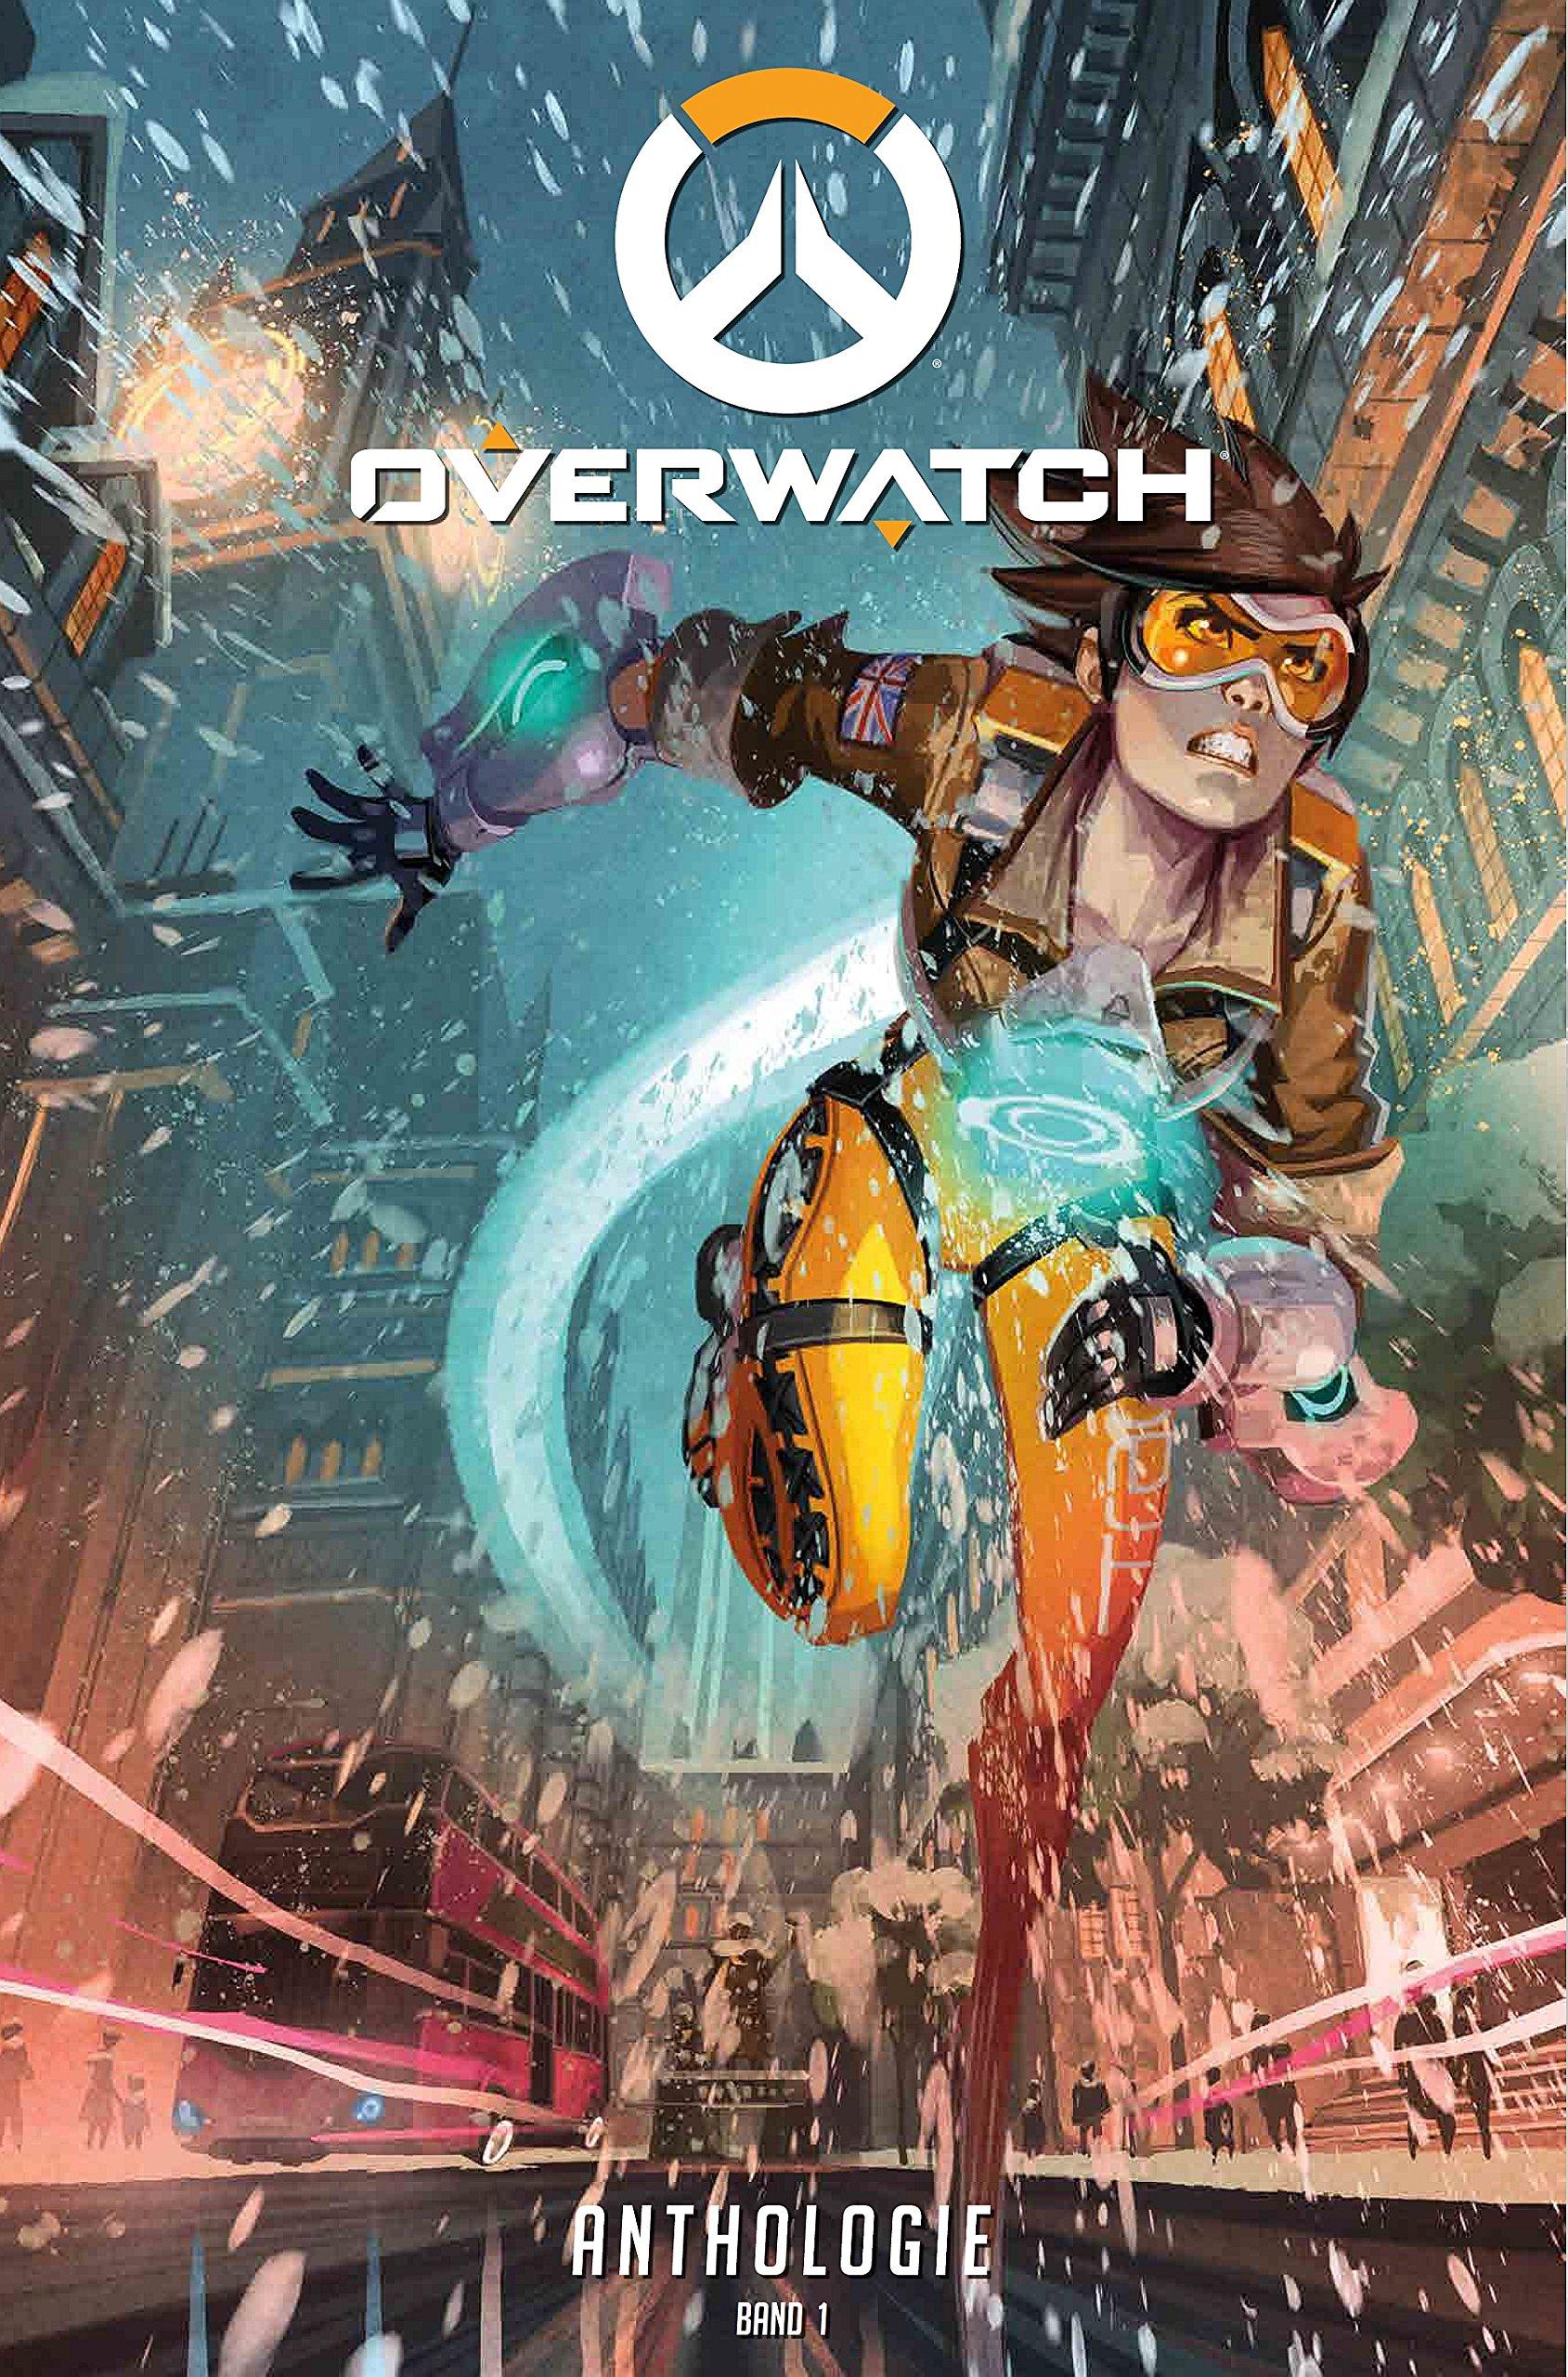 Overwatch: Anthologie: Amazon.de: Michael Chu, Miki Montlló, Robert ...